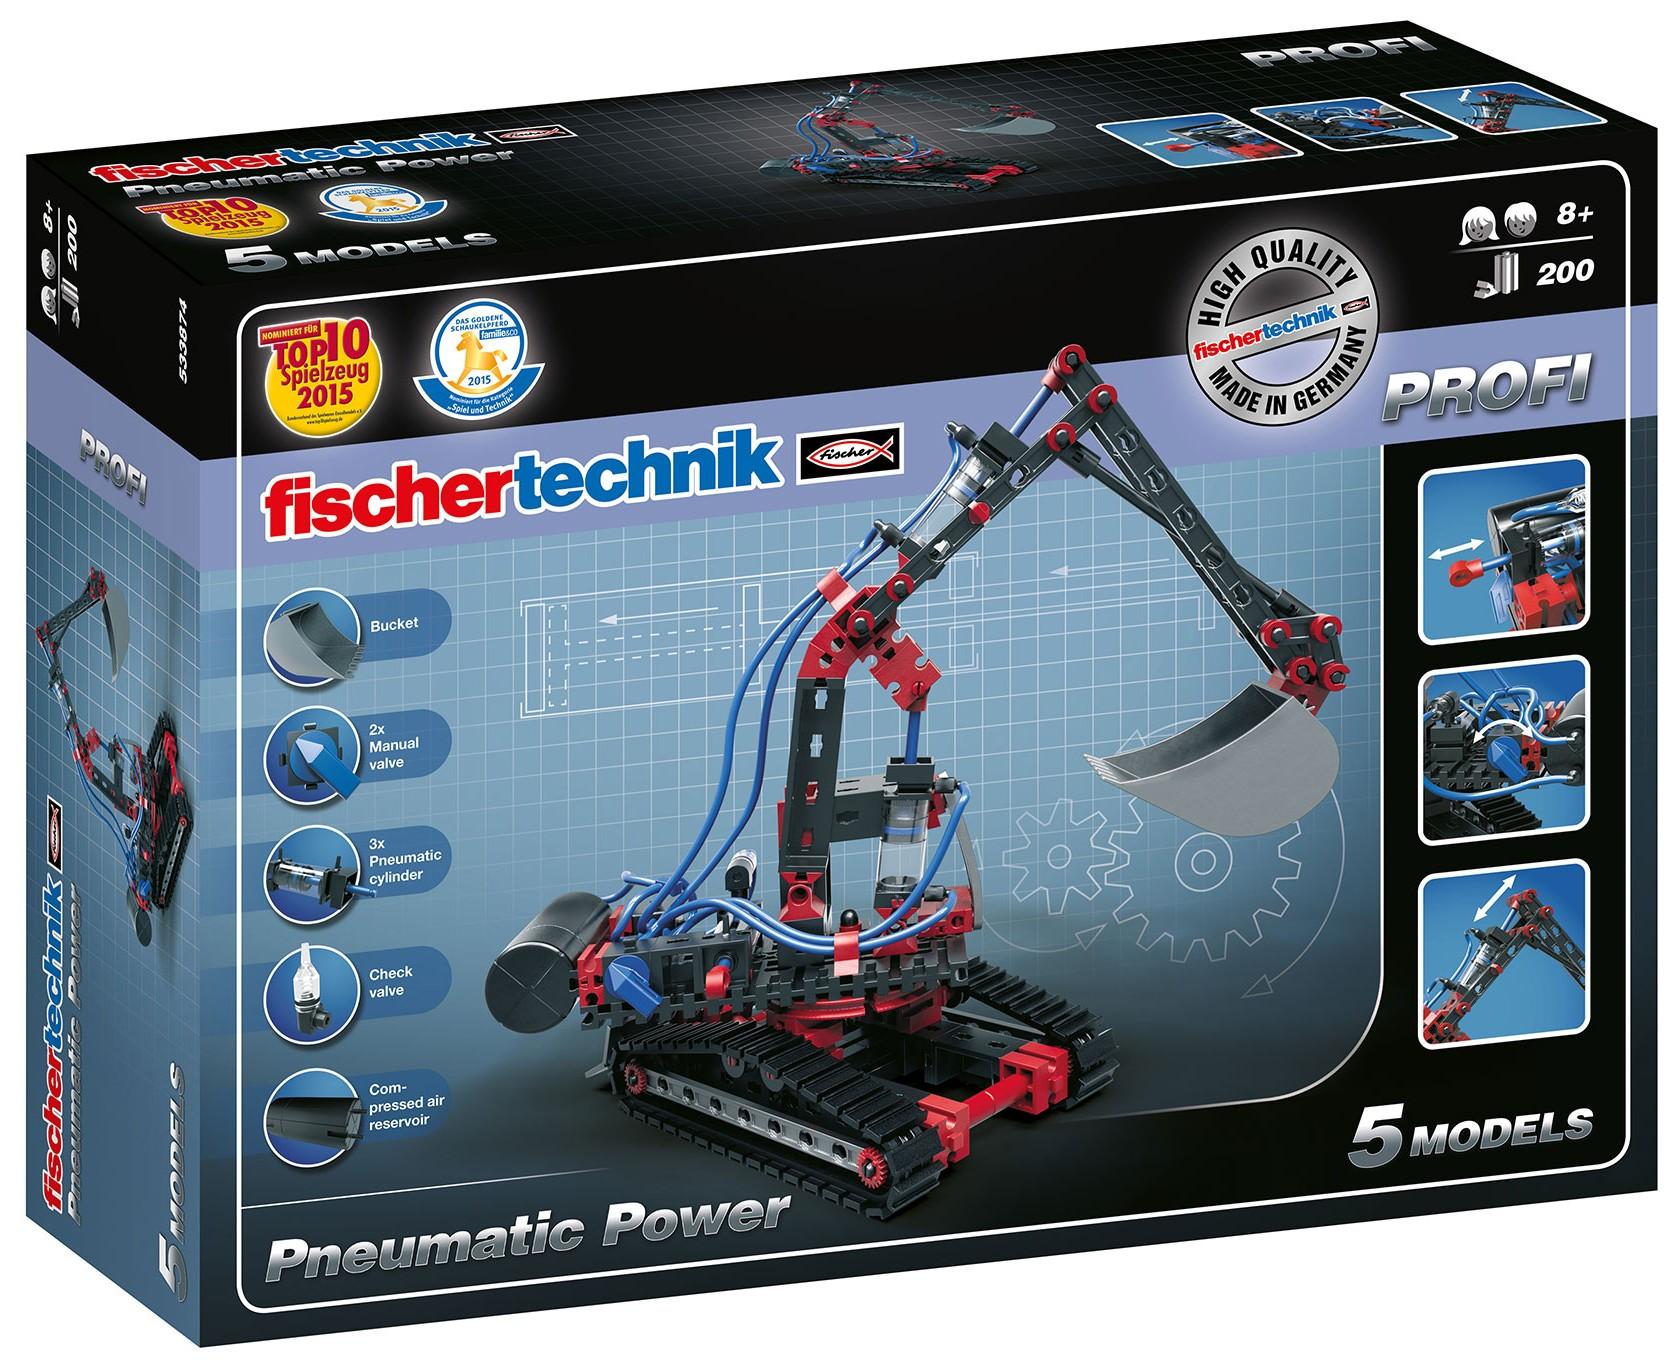 Pneumatic Power - 200 Bauteile Fischertechnik